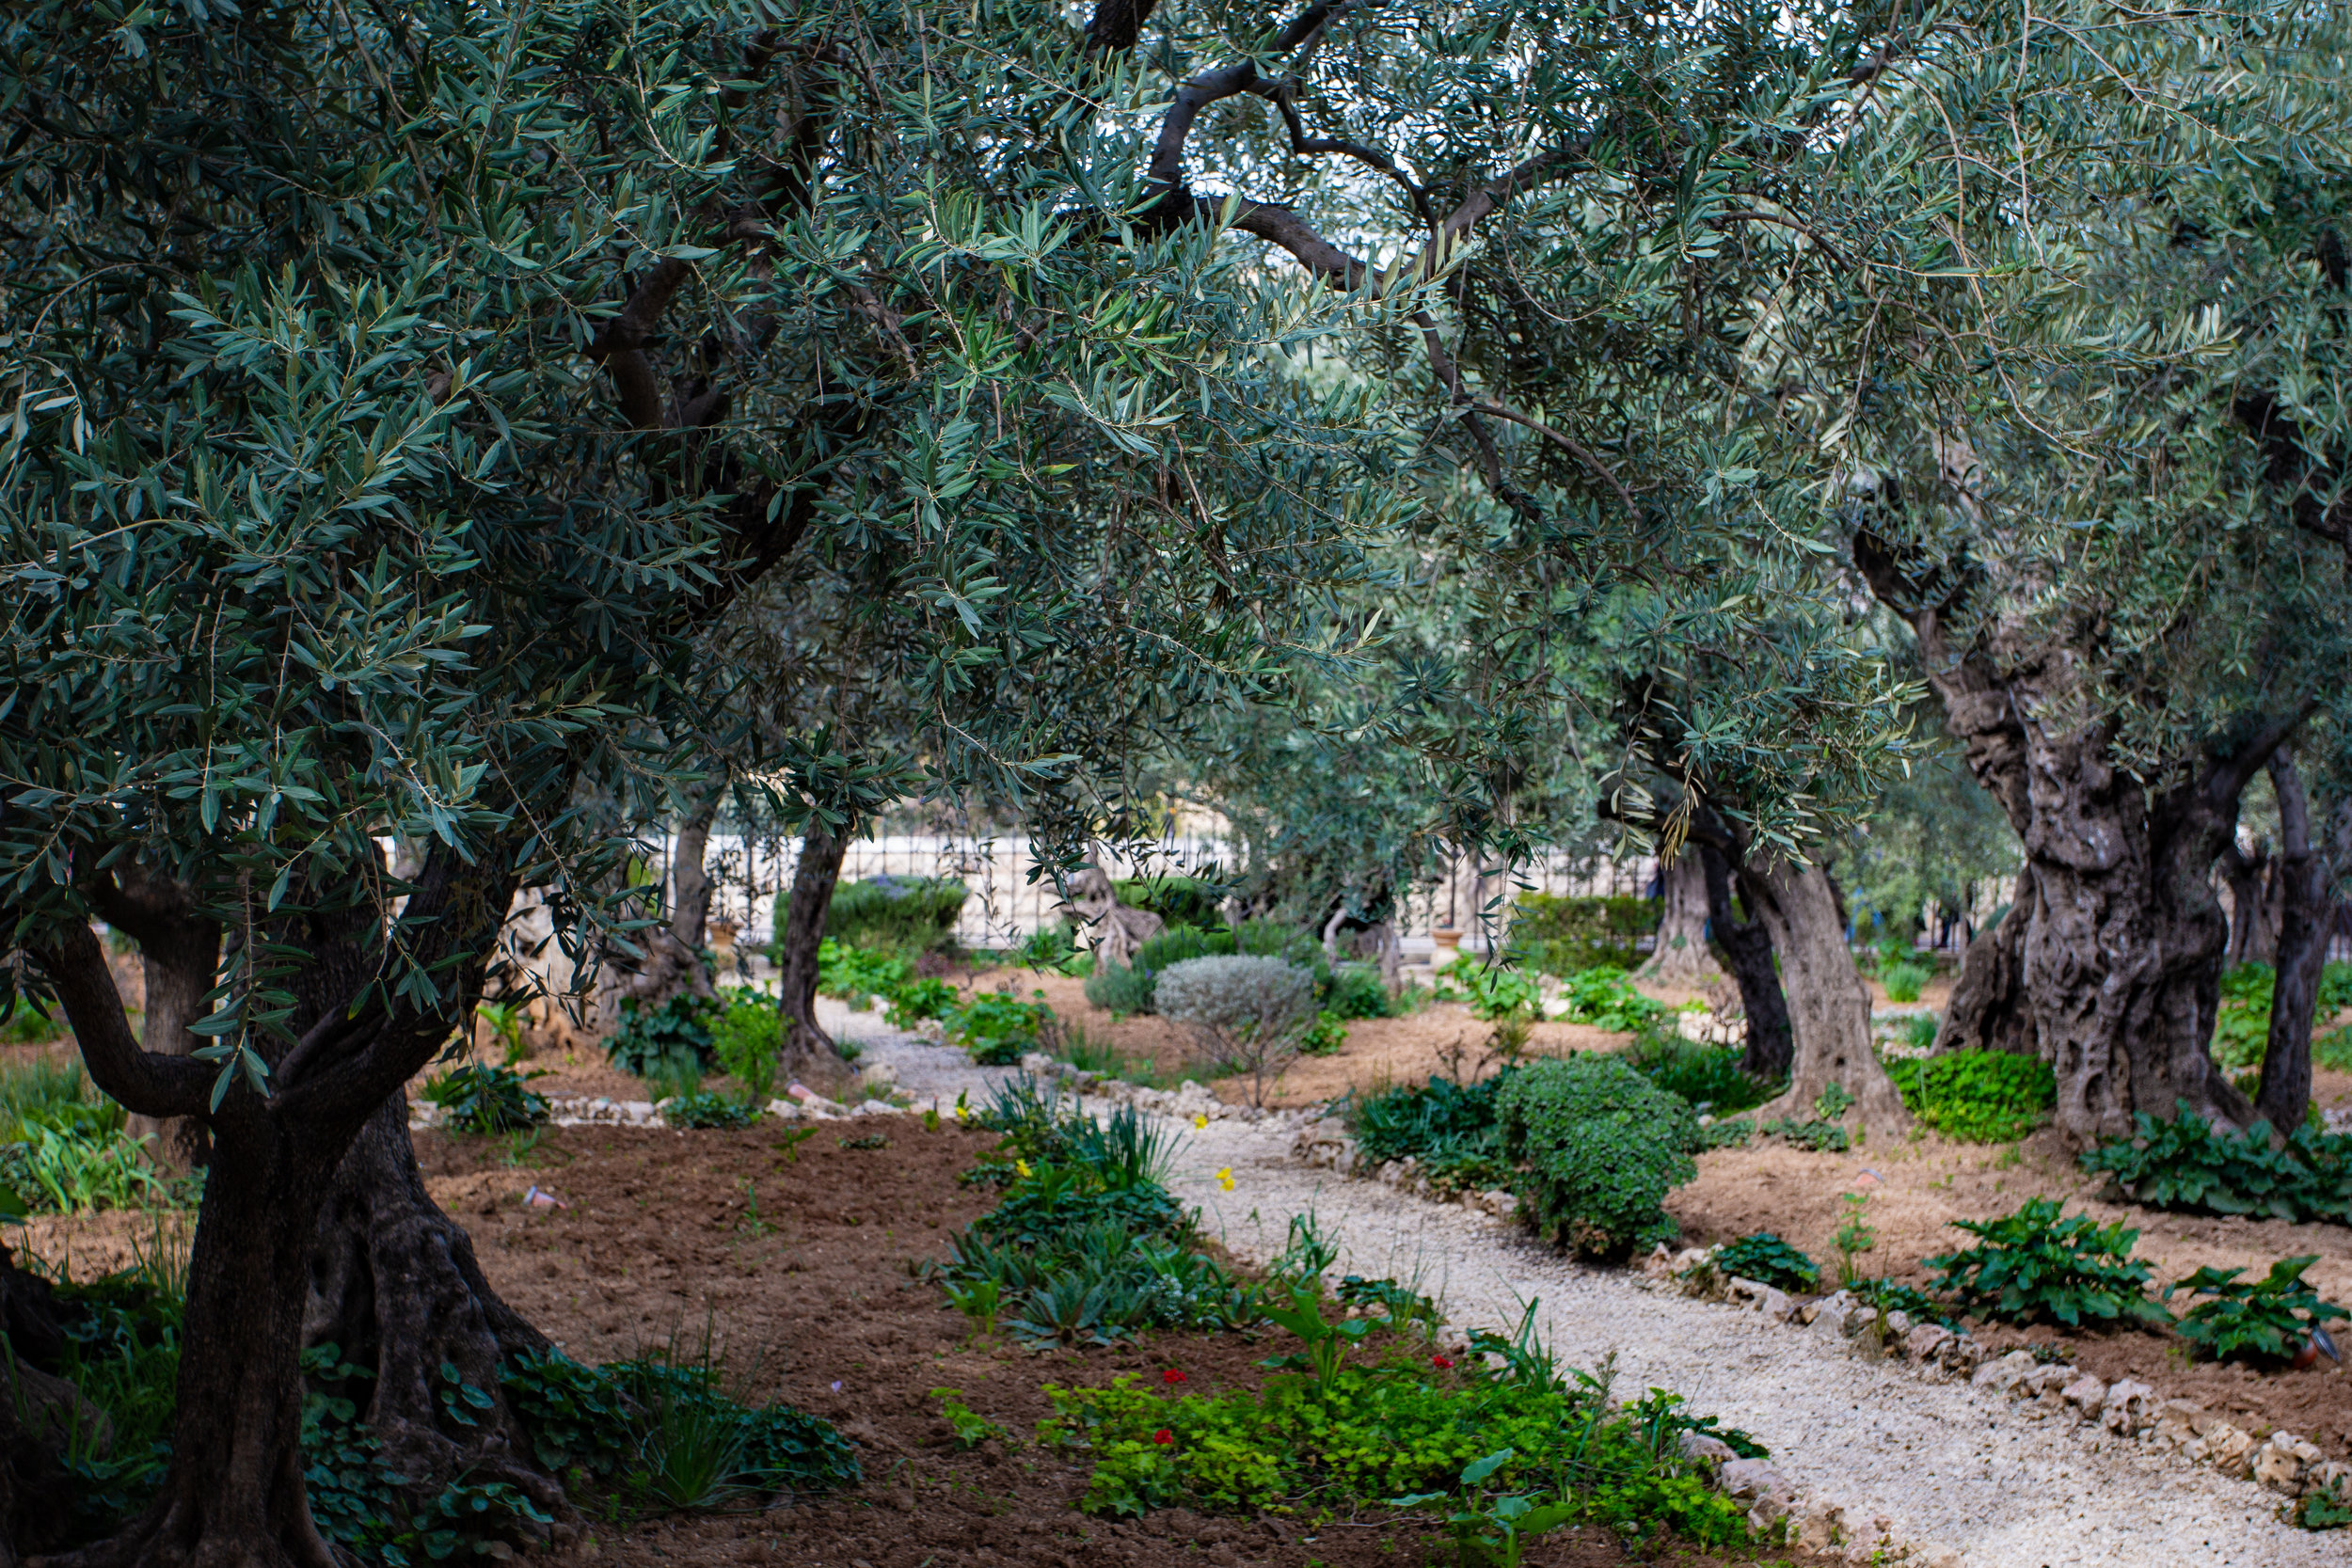 Garden of Gethsemane  Photo by  Stacey Franco  on  Unsplash